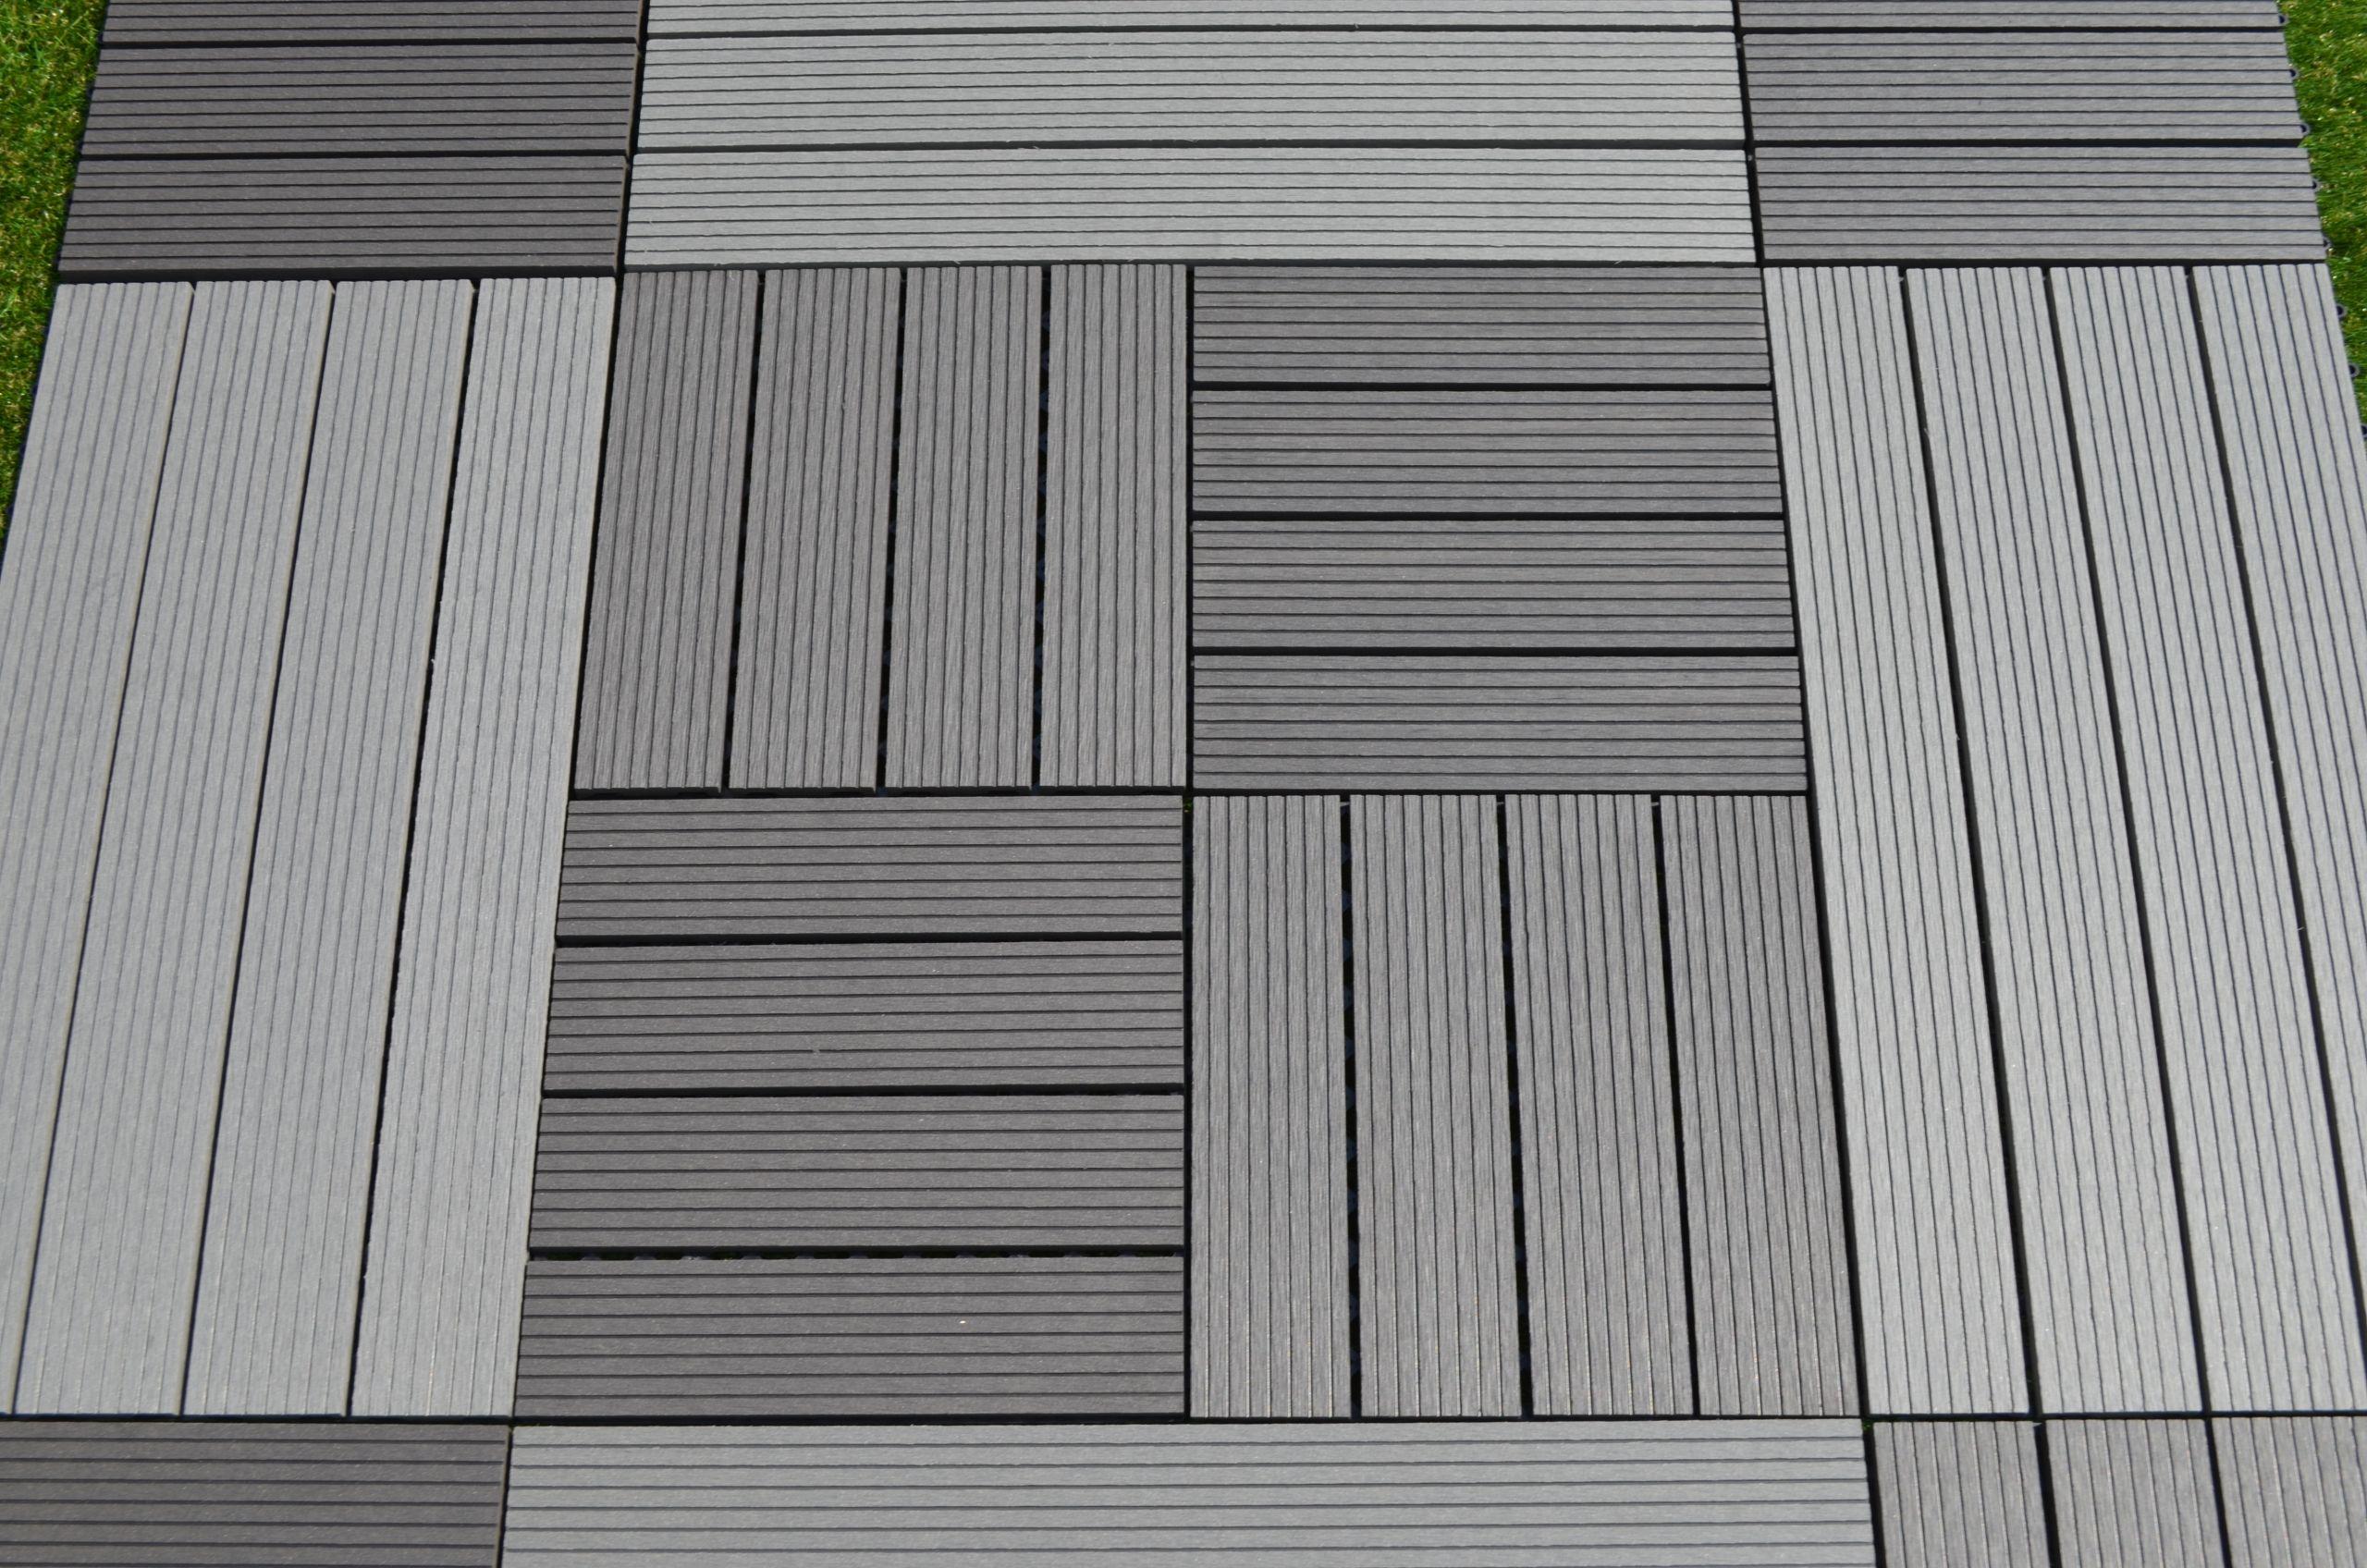 Terrasse posite sur dalle